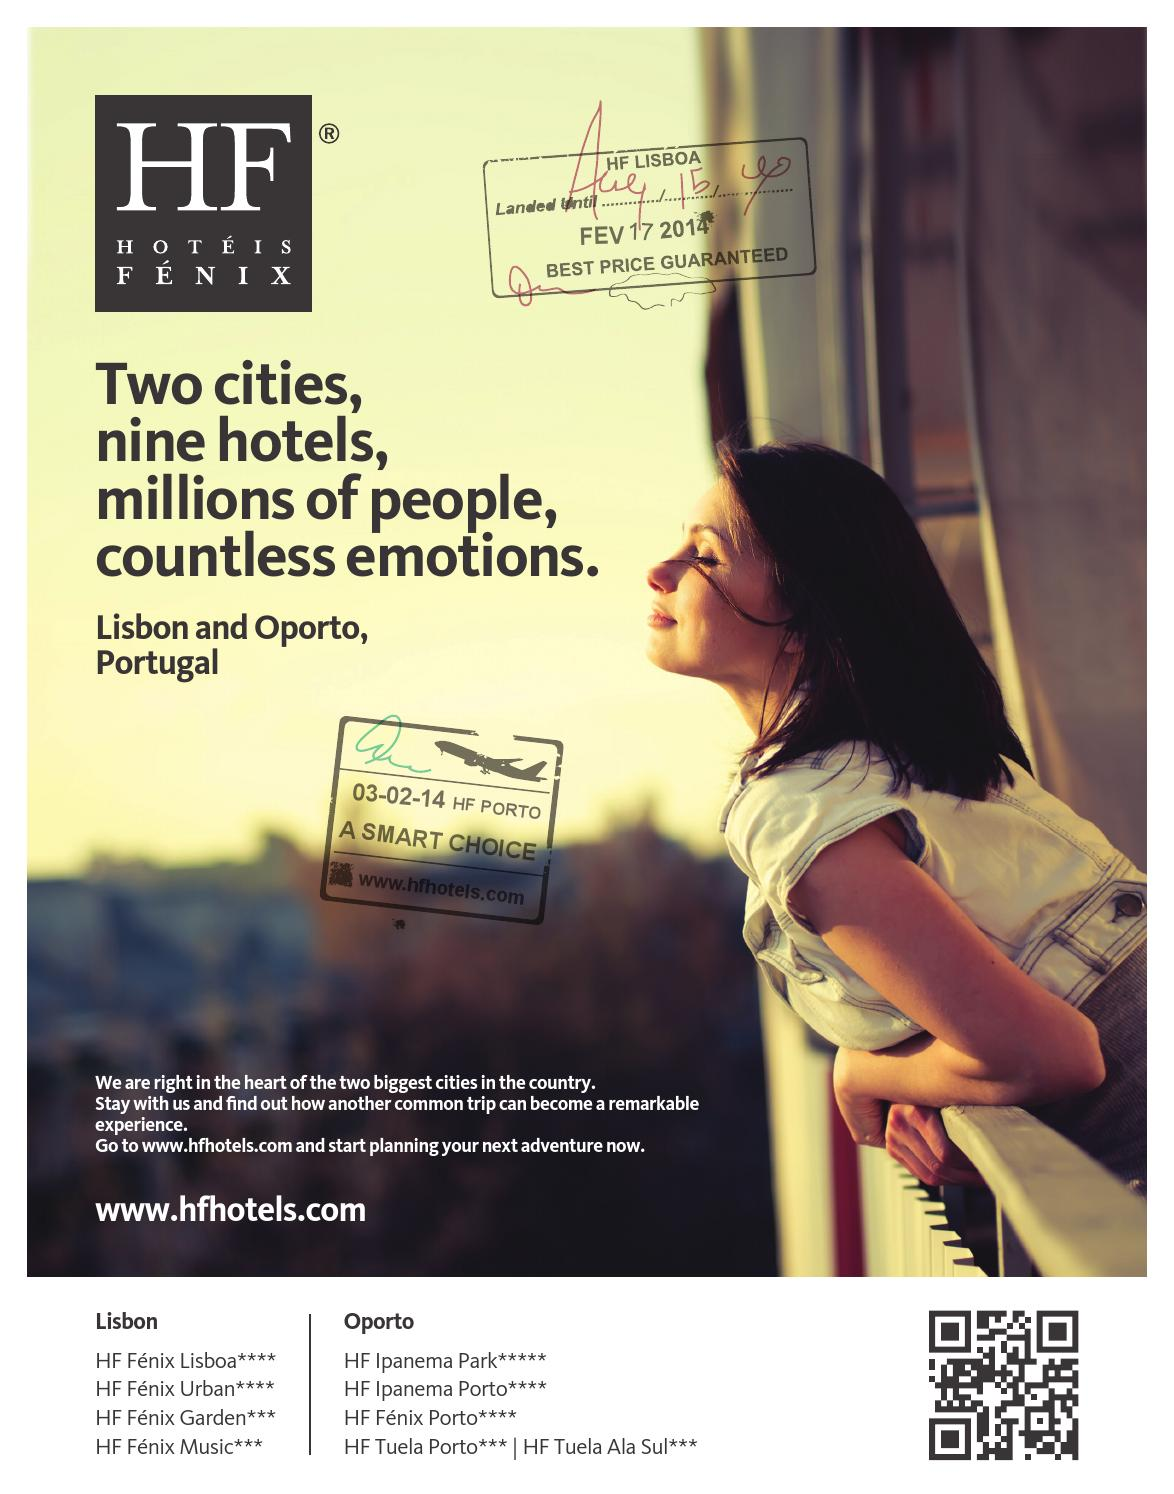 Hf Hot 233 Is F 233 Nix 10th Anniversary Print Ad By Hf Hotels